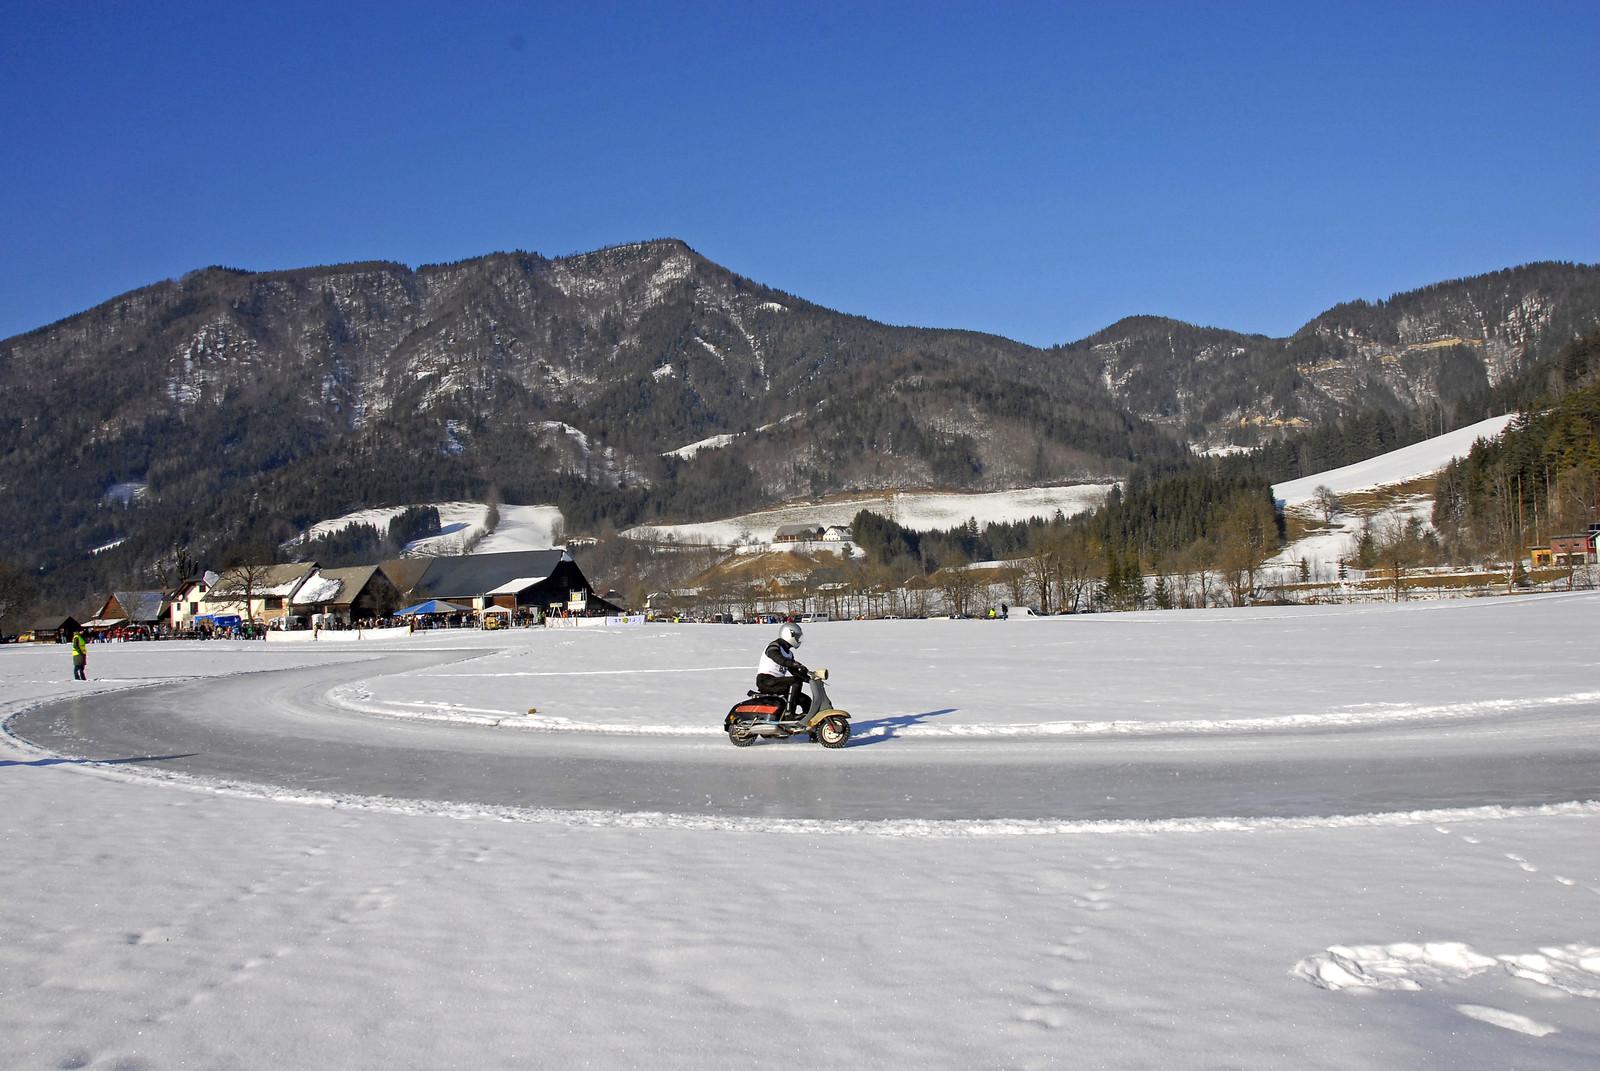 Vespa Eisrennen Ybbstal (Austria) 2012